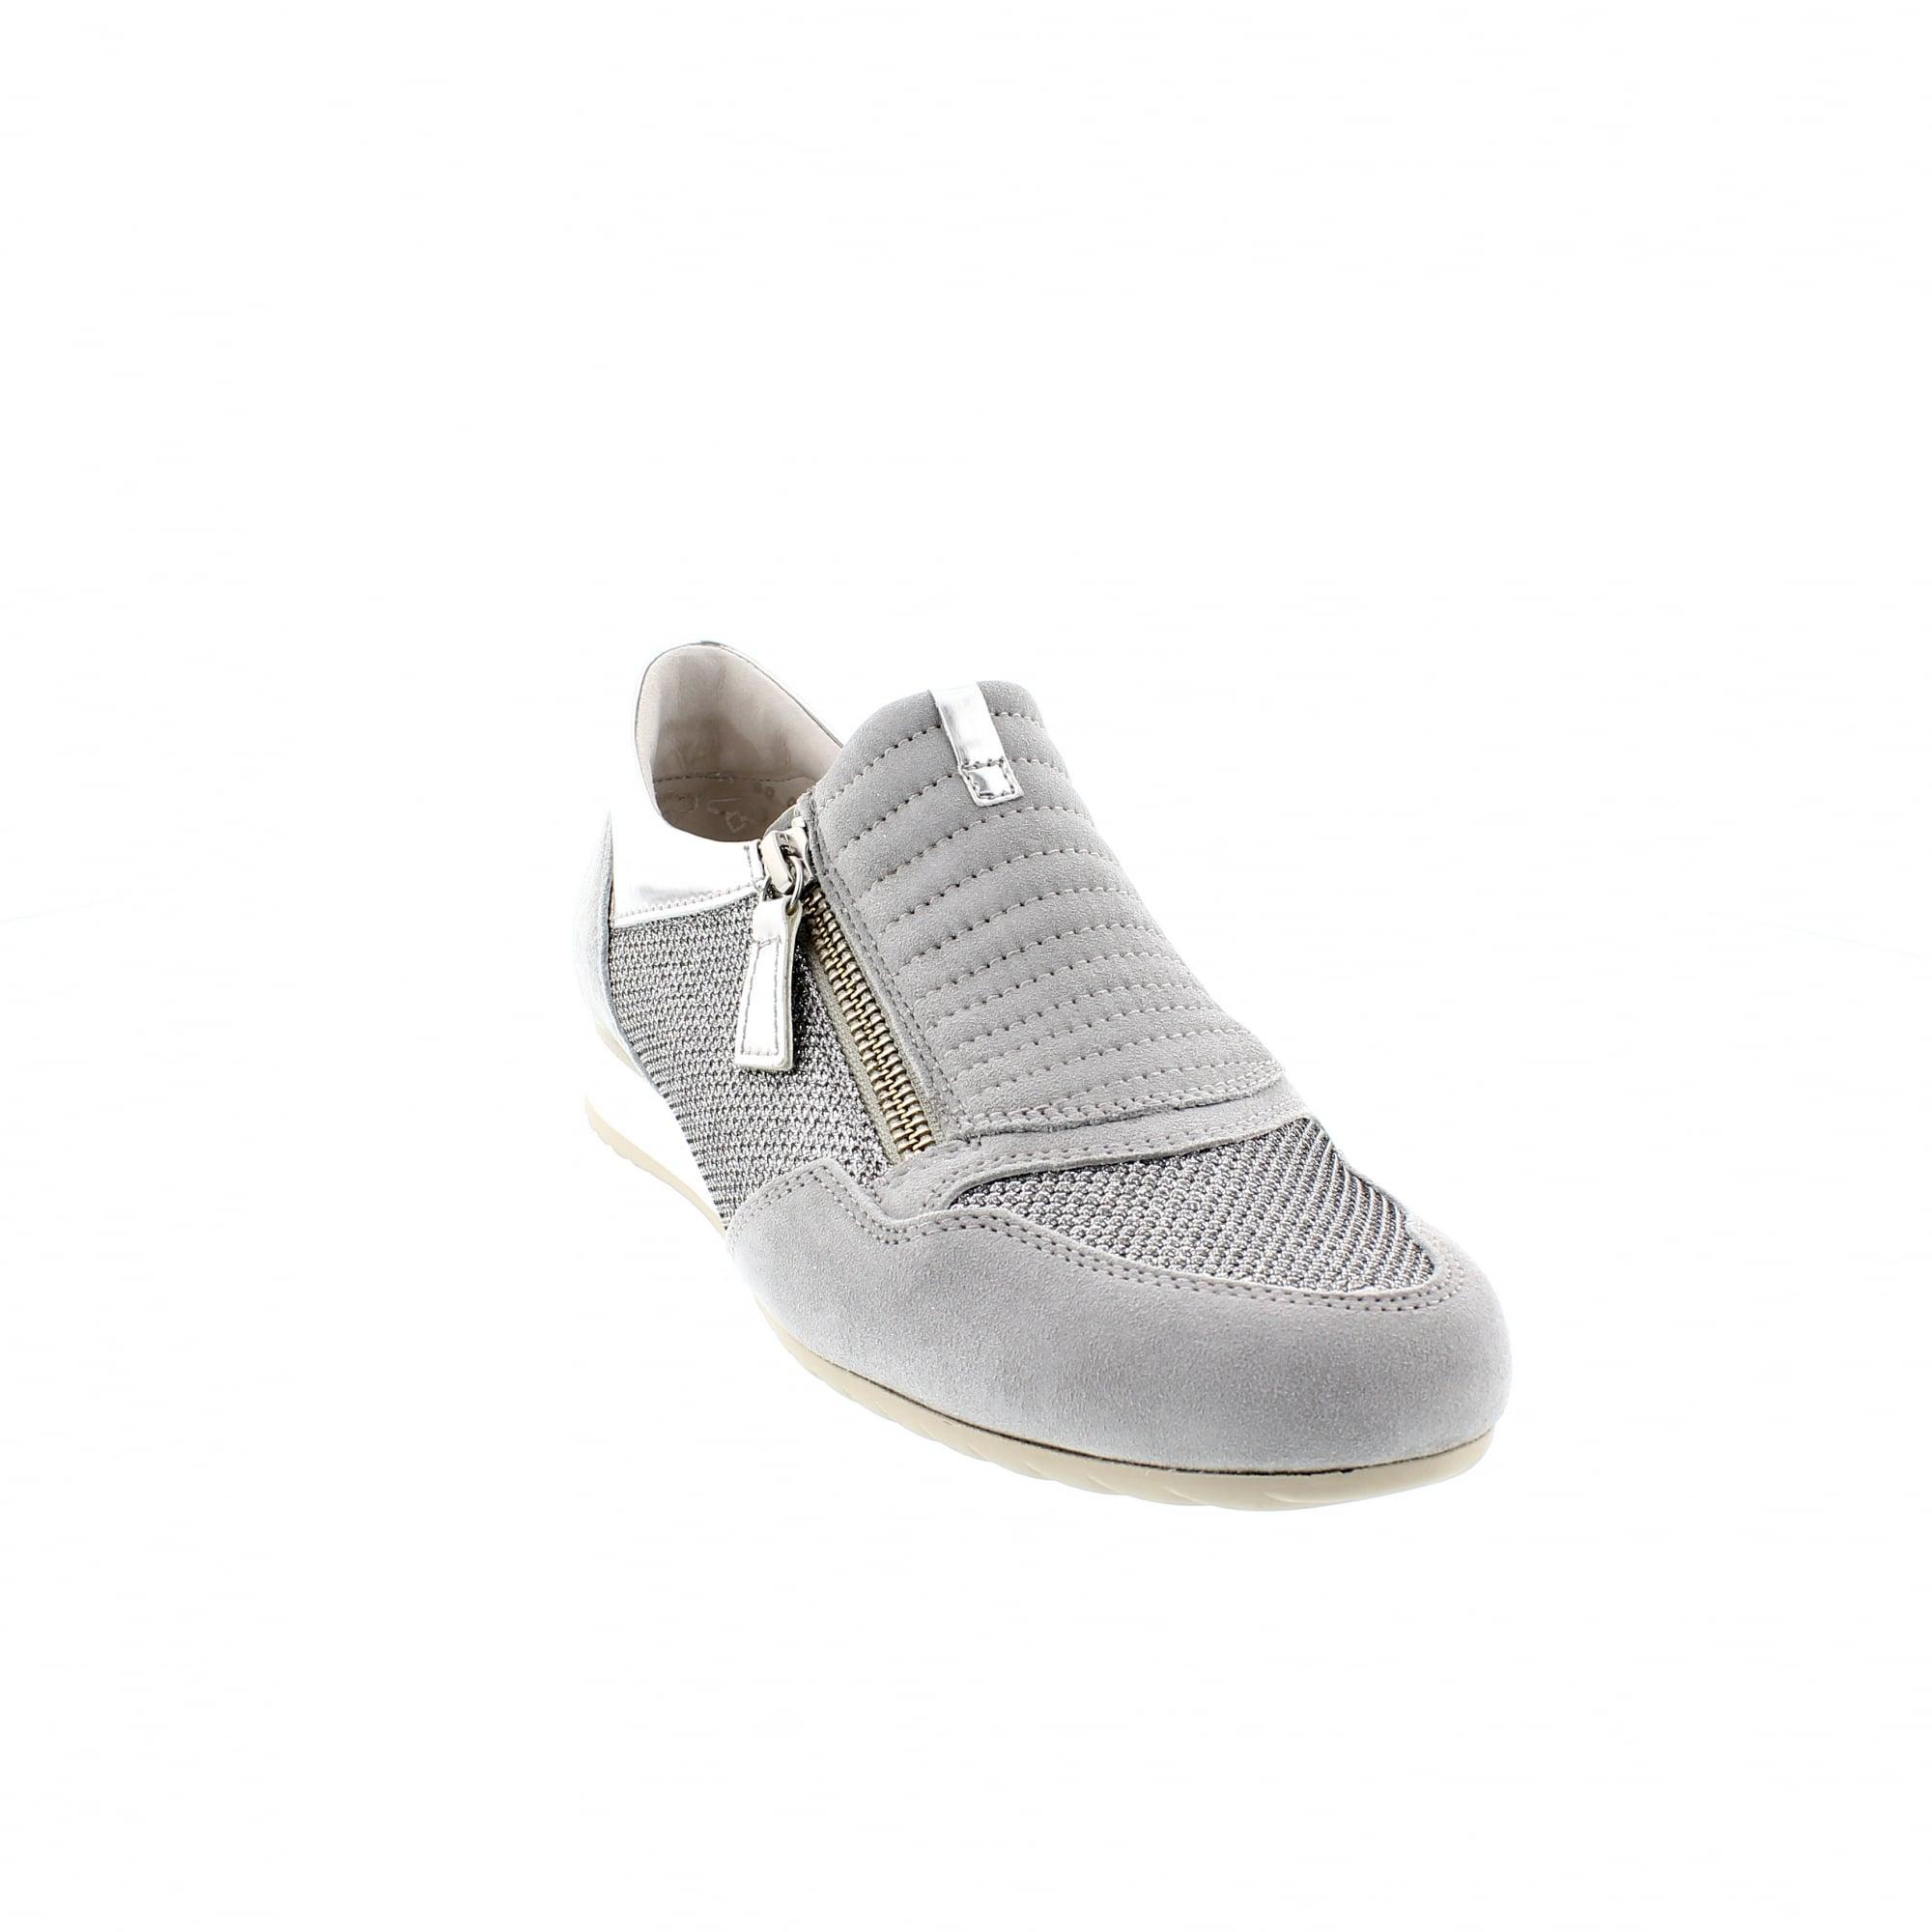 87915767a3fe81 Gabor Brunello 26-352-42 Grey Silver Slip On Trainers